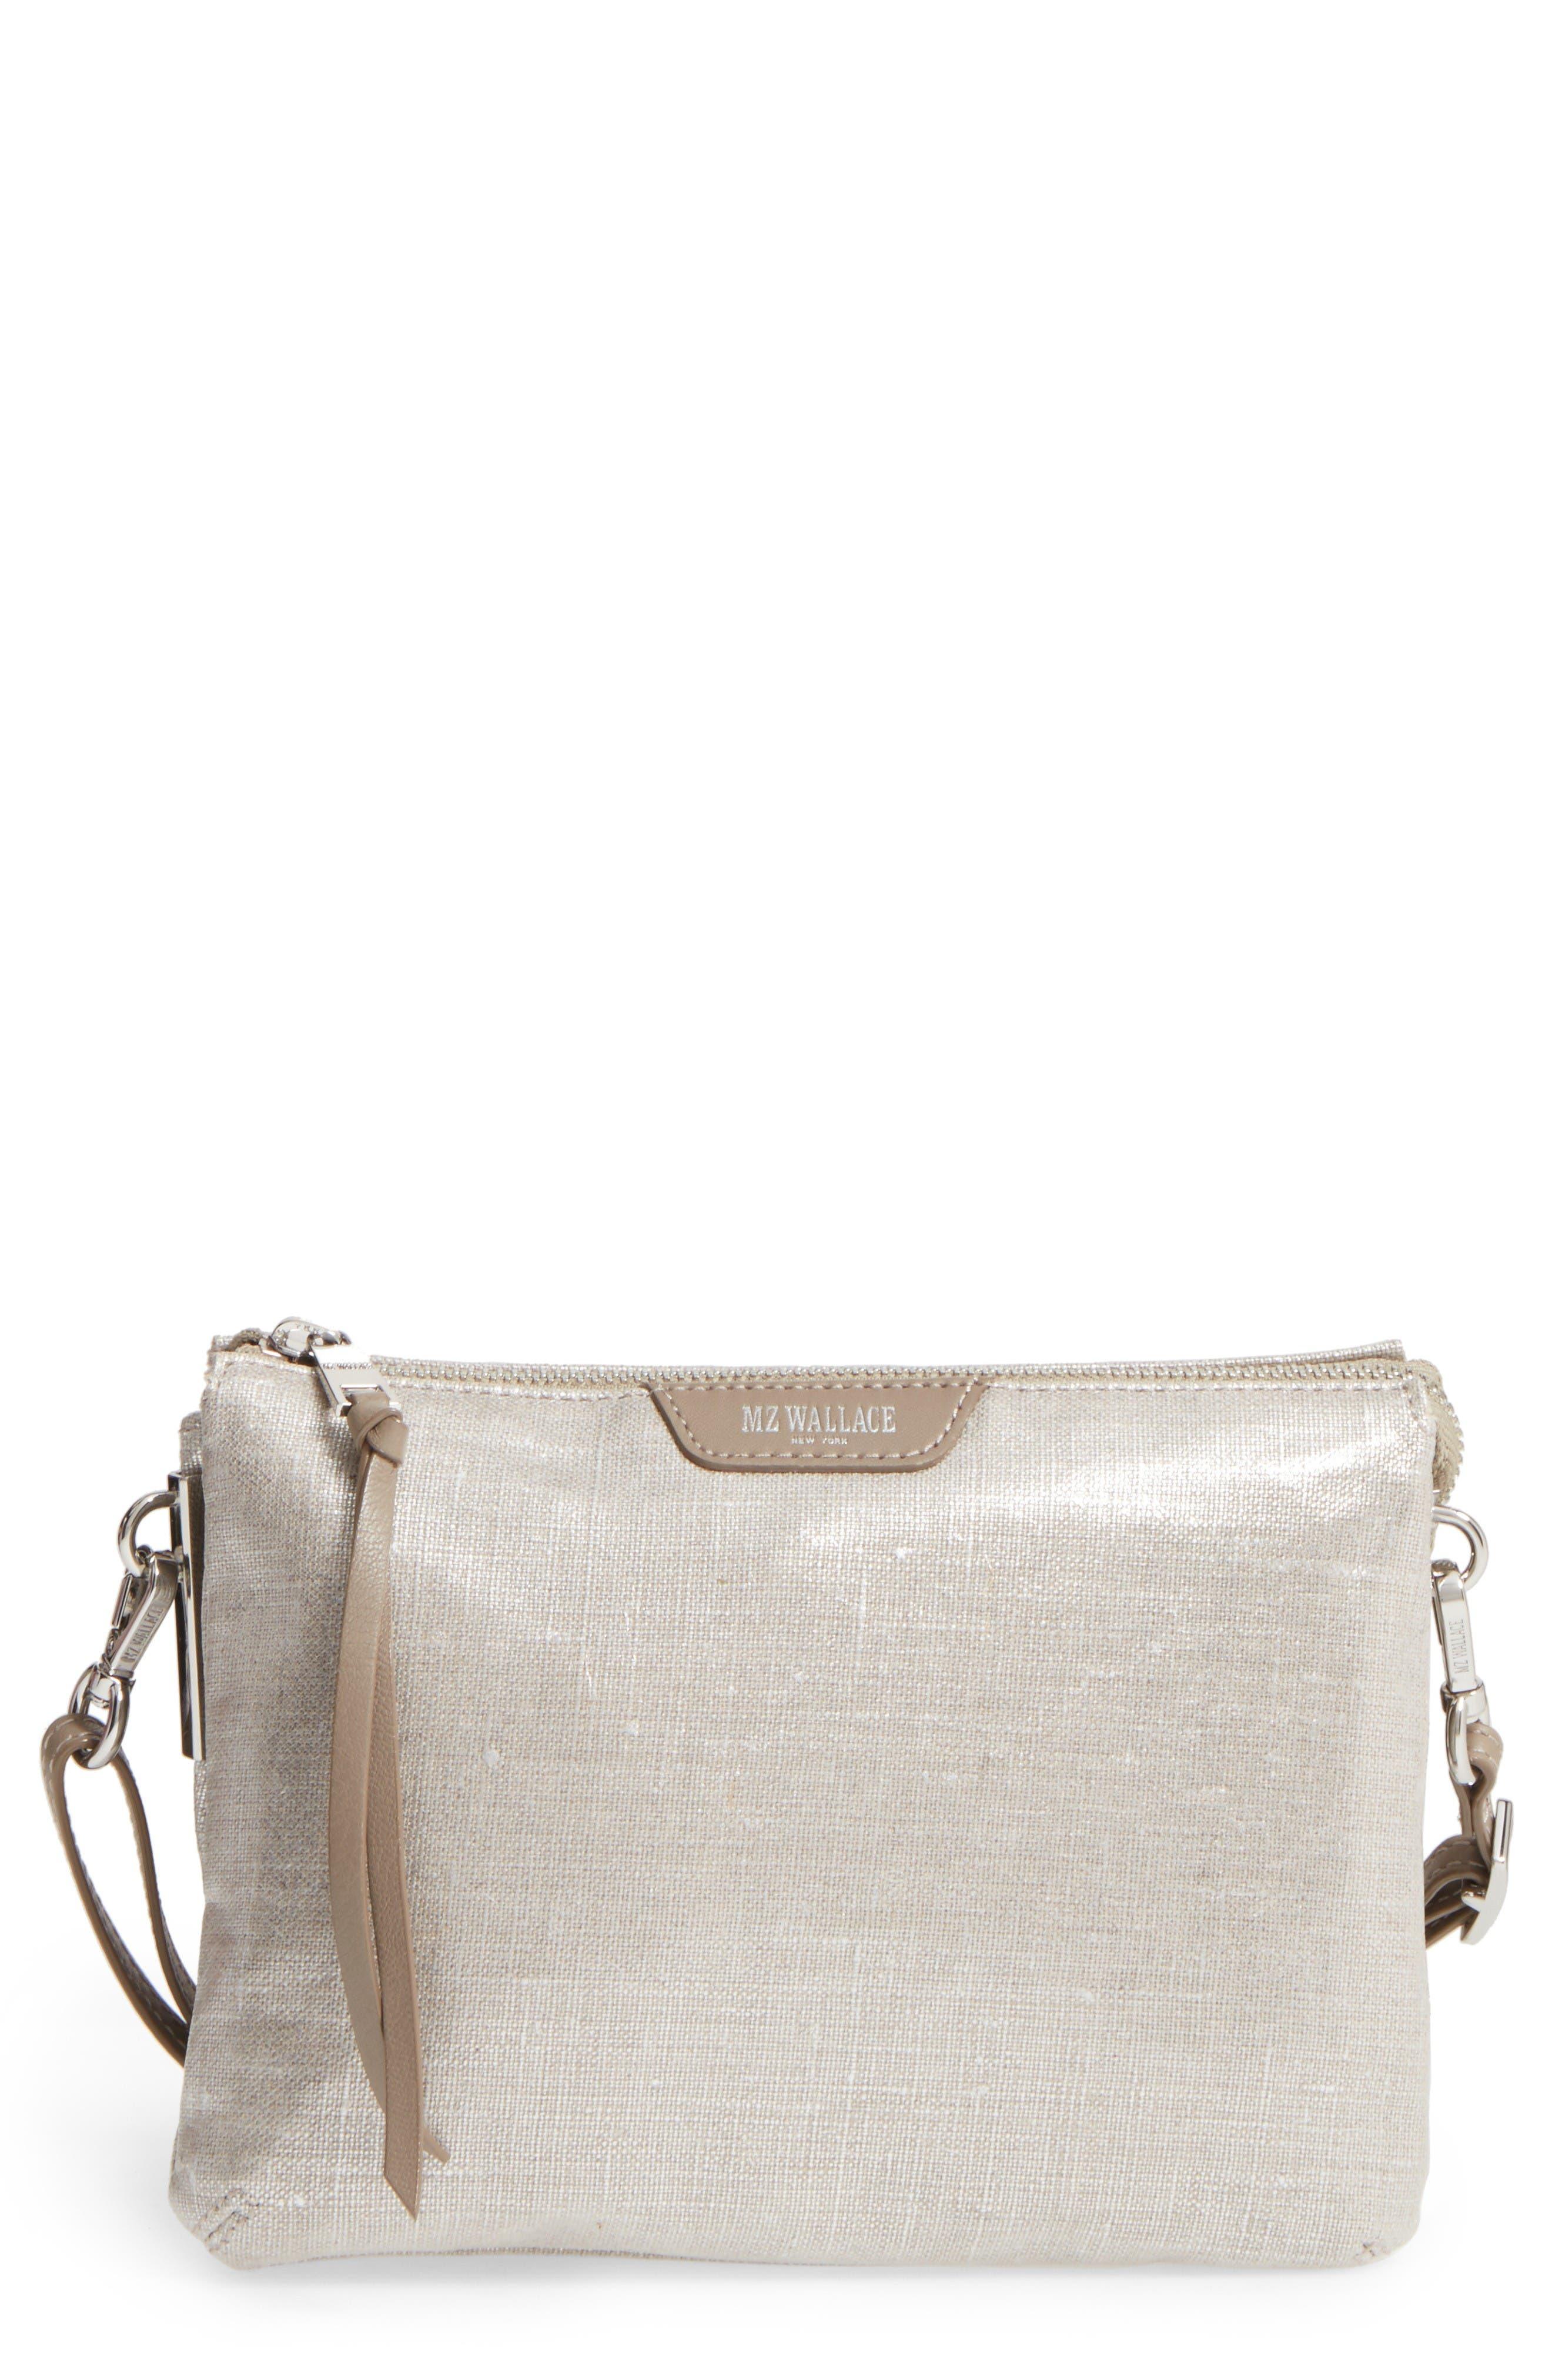 MZ Wallace 'Pippa' Bedford Nylon Crossbody Bag